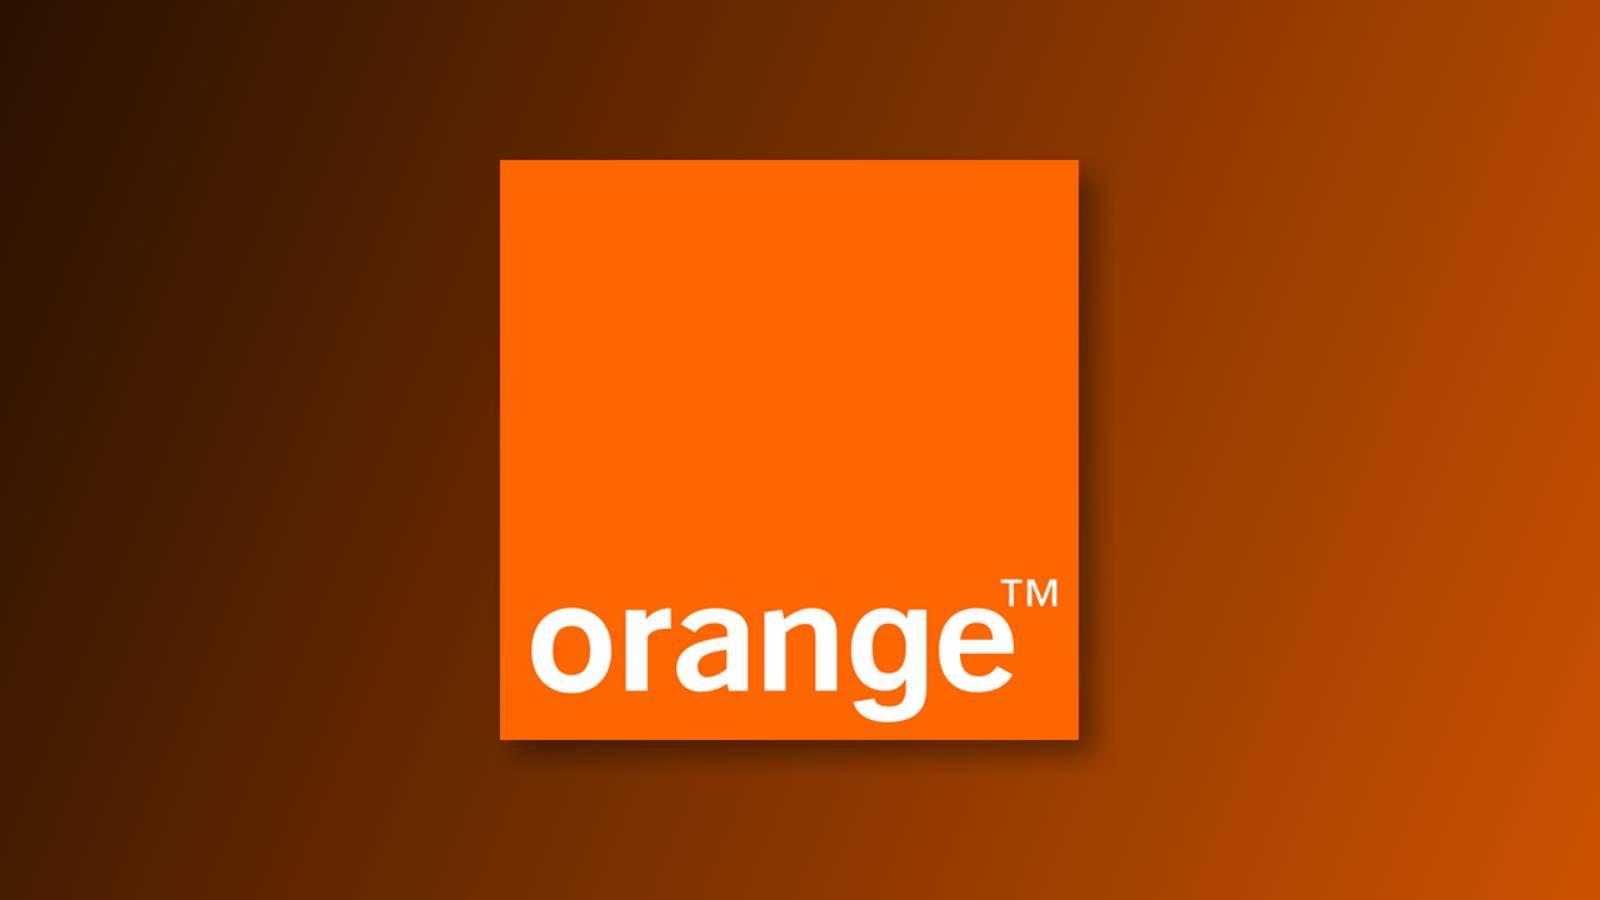 Orange reduceri speciale telefoane romania